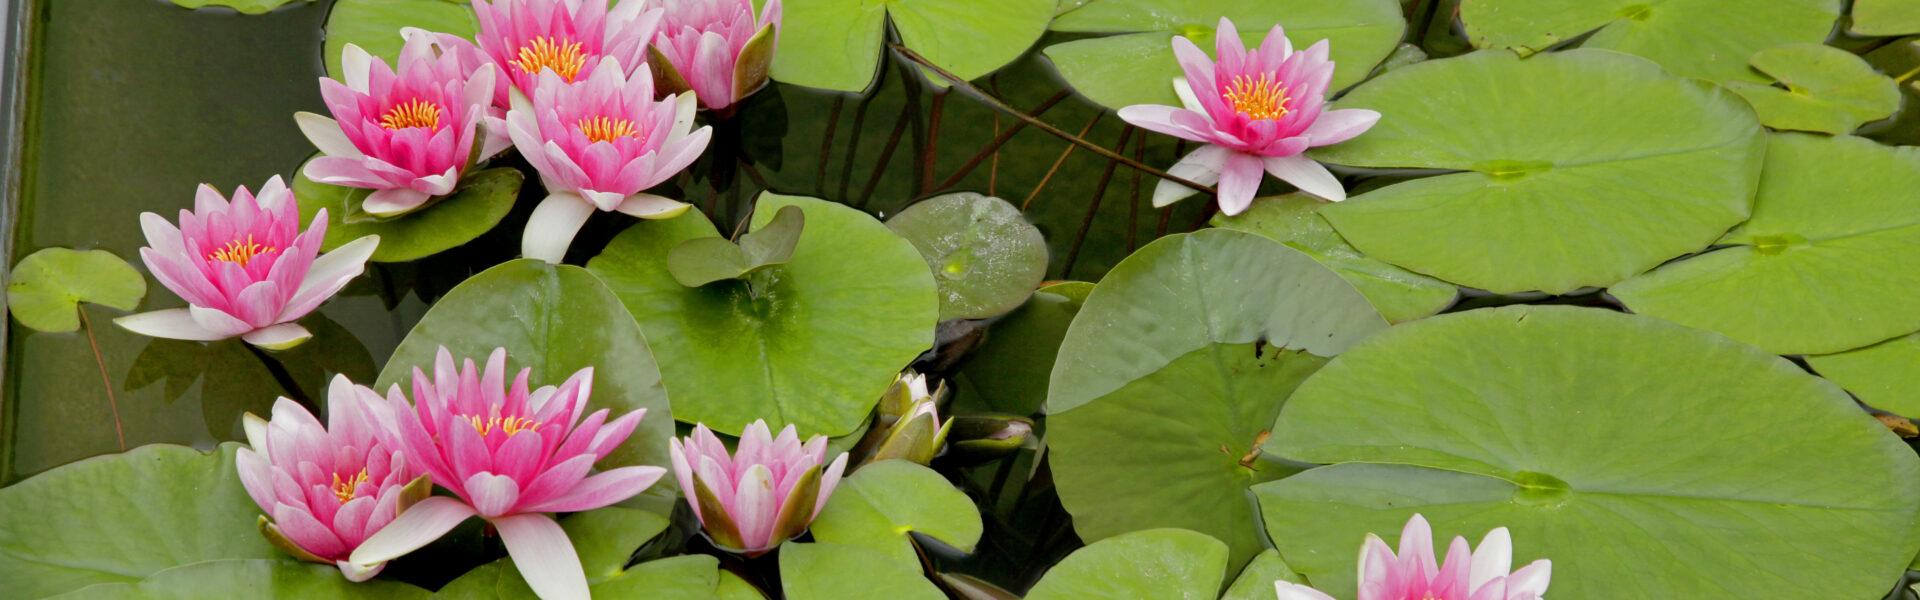 Garten. Wasser. Blog.